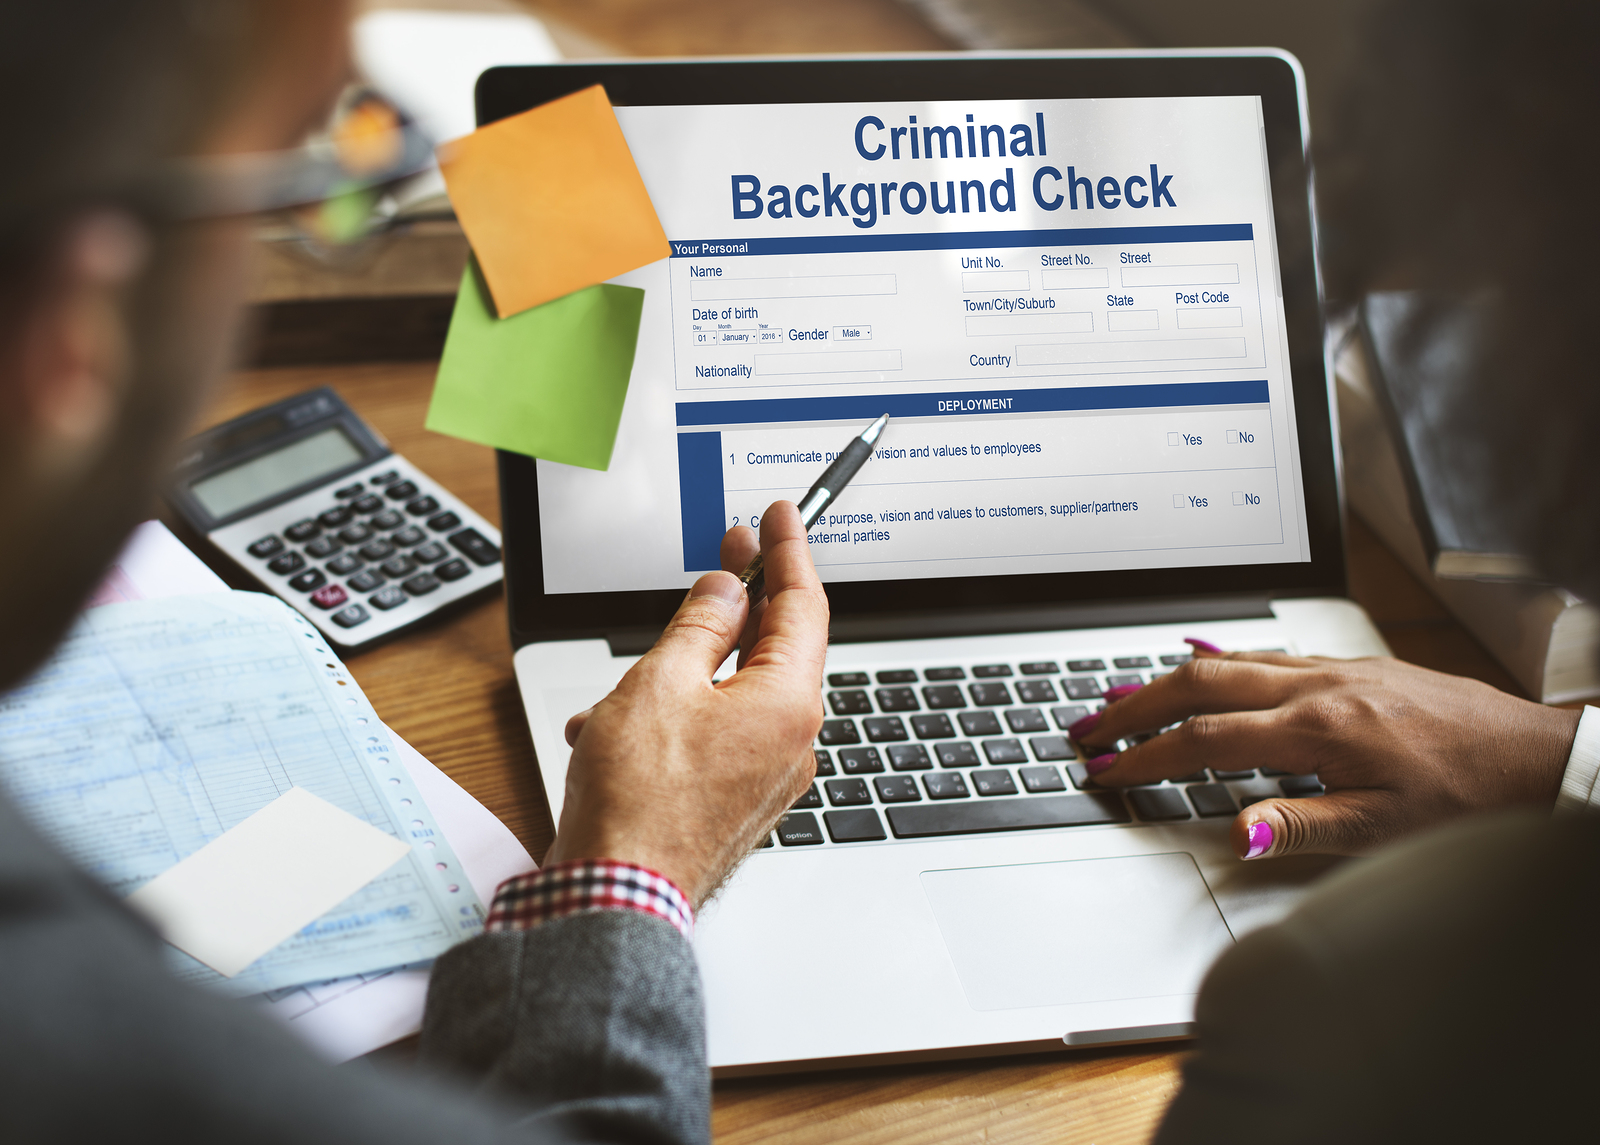 bigstock-Criminal-Background-Check-Insu-145491782